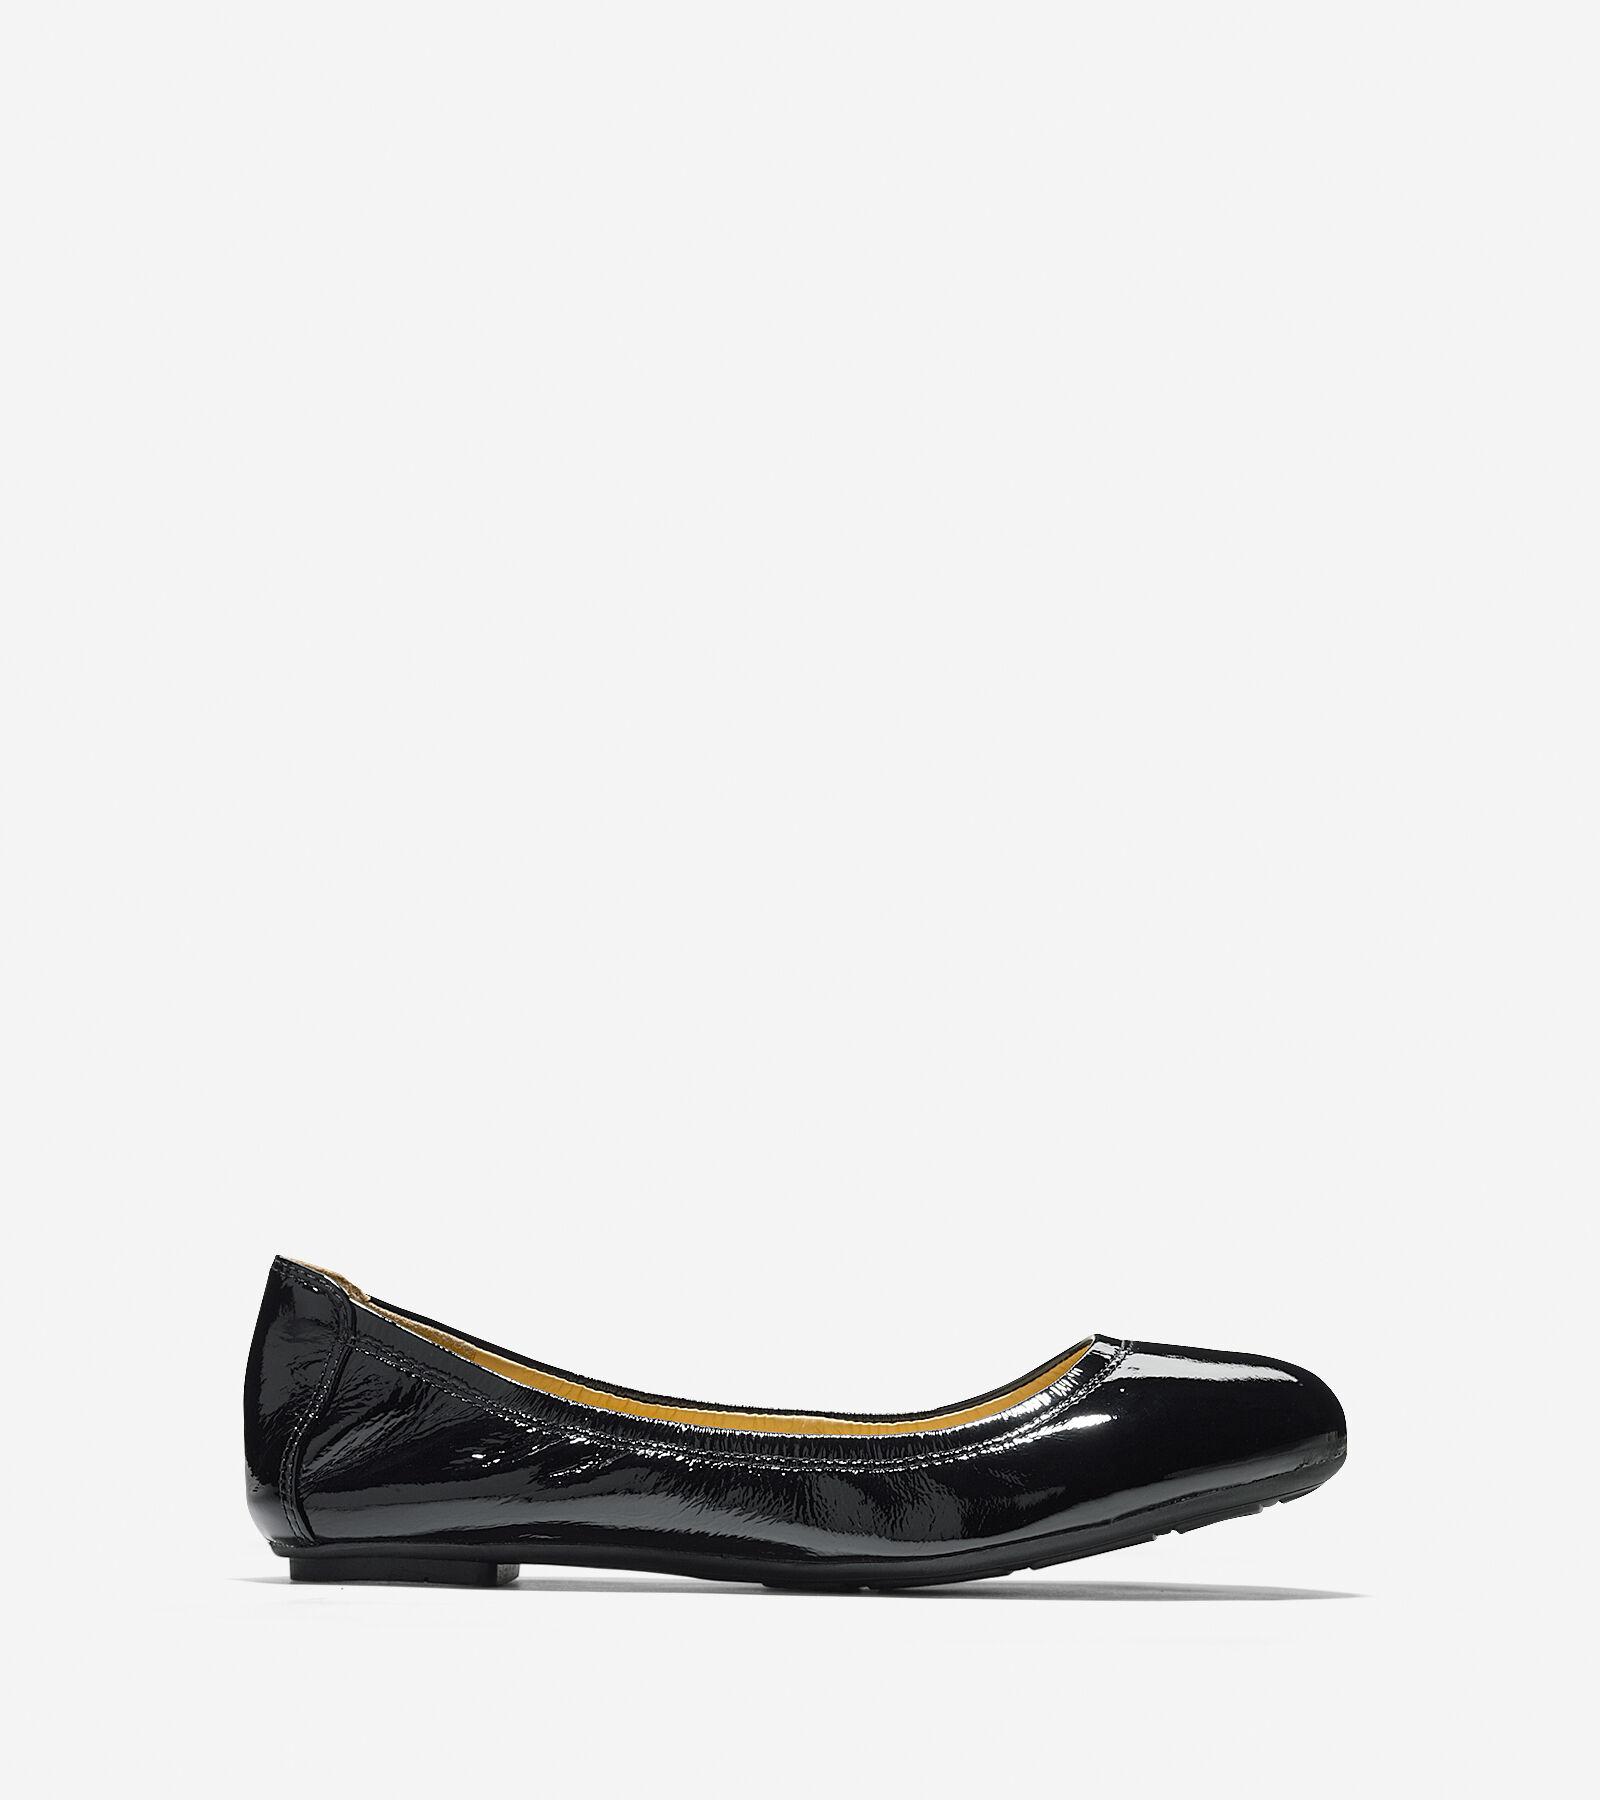 Clothing, Shoes & Accessories Me Too Lisa Sz 6 M Mauve Leather Ballet Flats Shoes